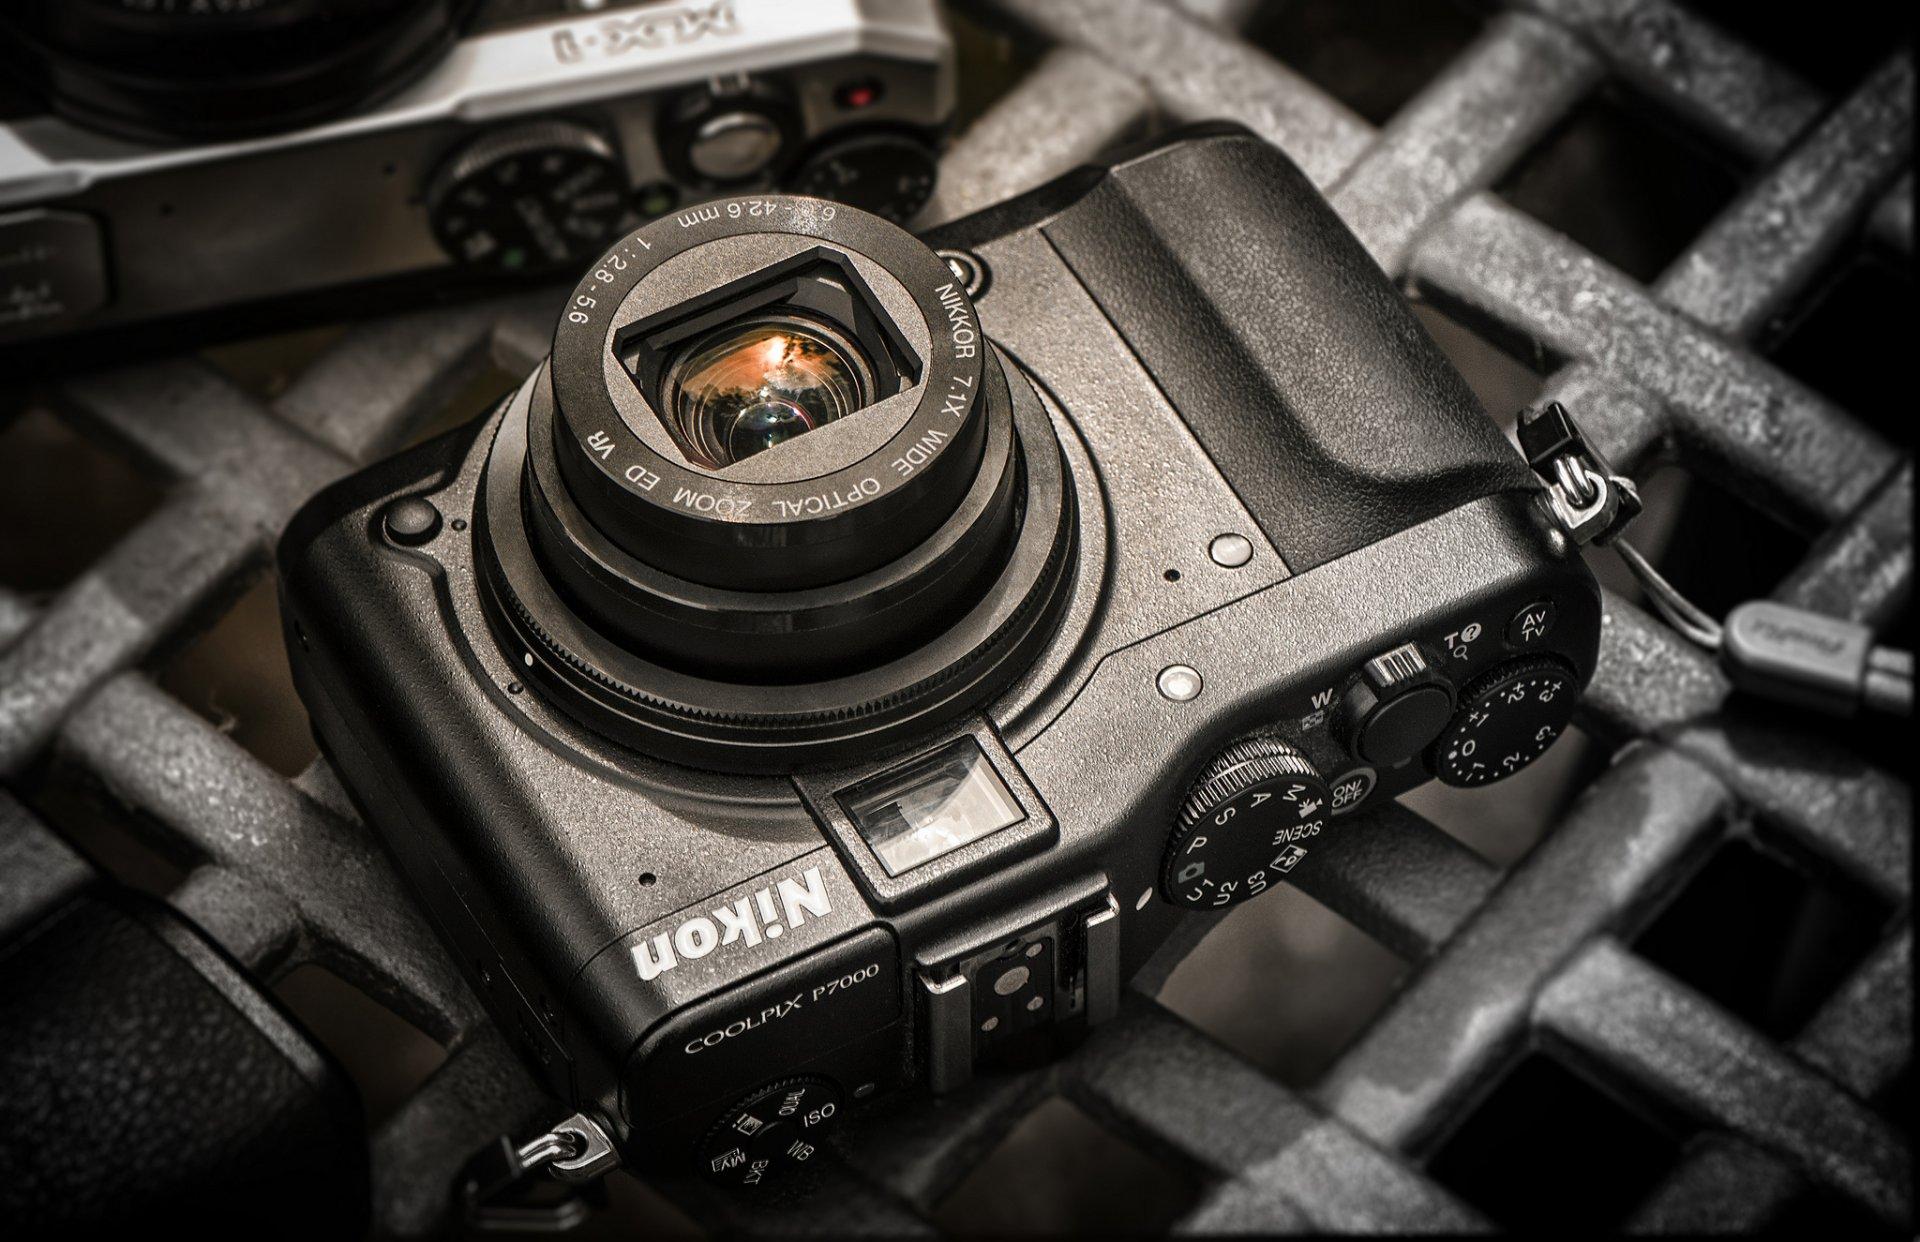 Фотоаппарат Nikon старый  № 3624434 бесплатно